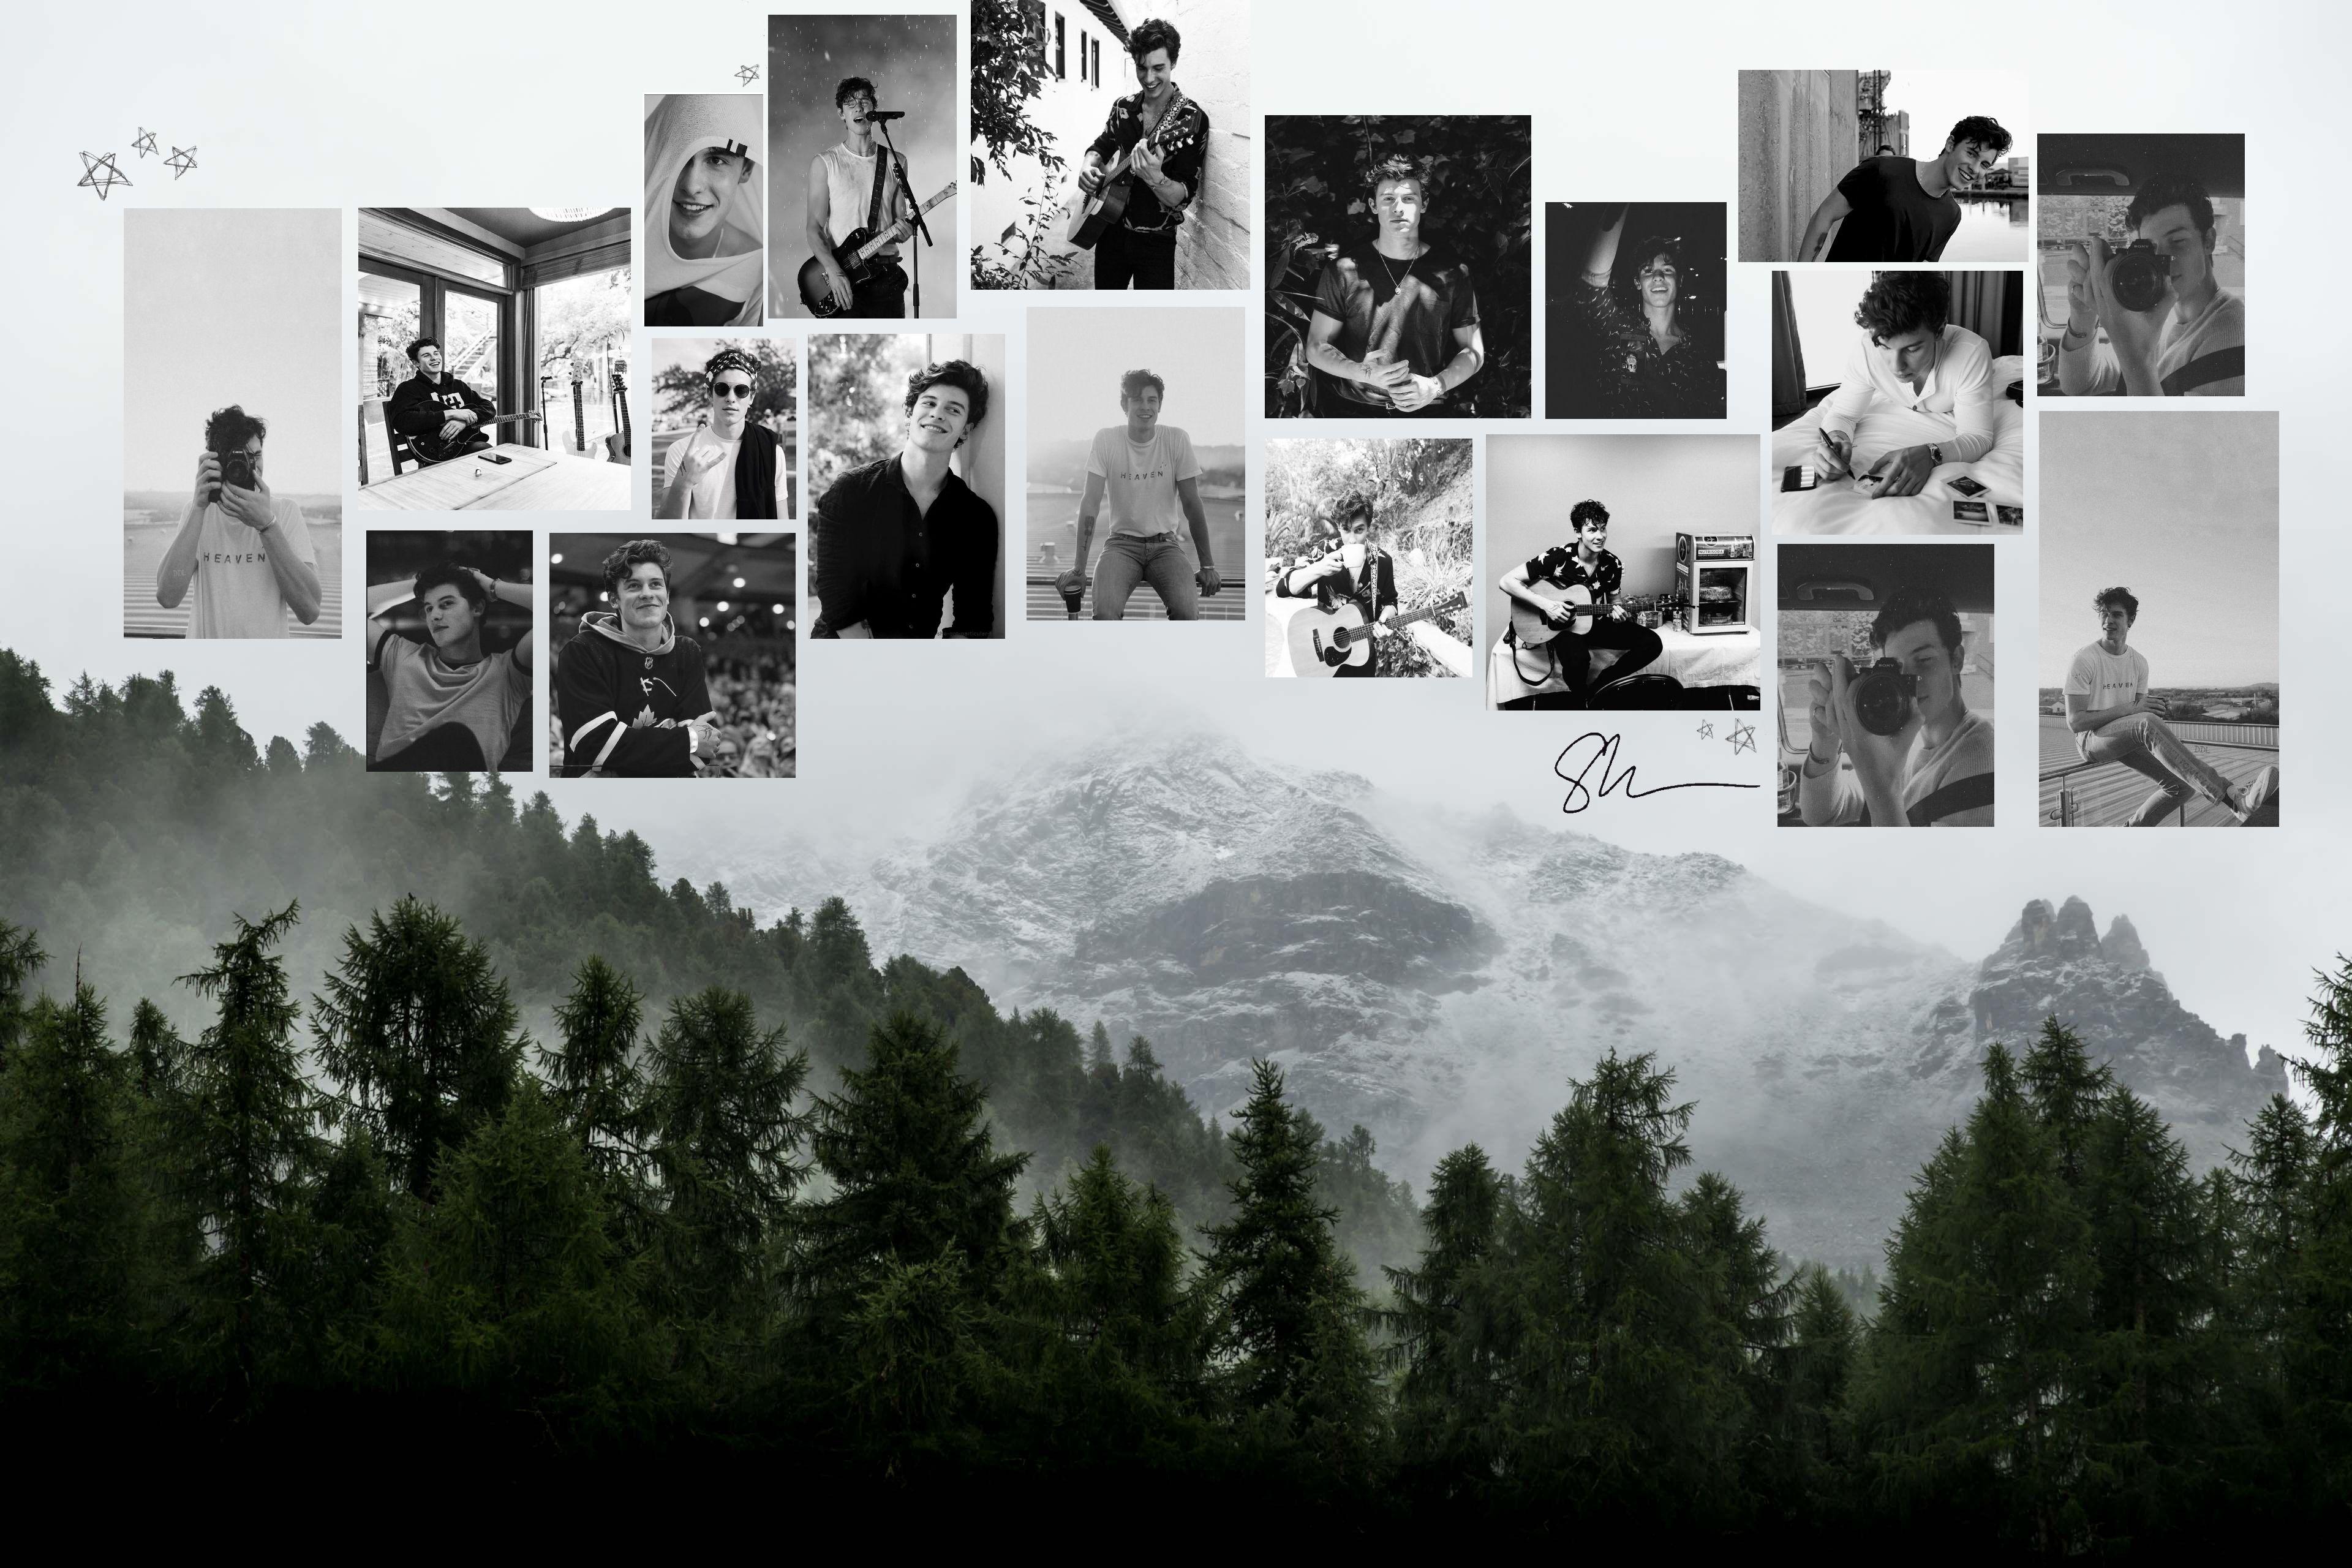 Shawn Mendes Wallpaper Desktop Shawn Mendes Wallpaper Shawn Mendes Imac Wallpaper